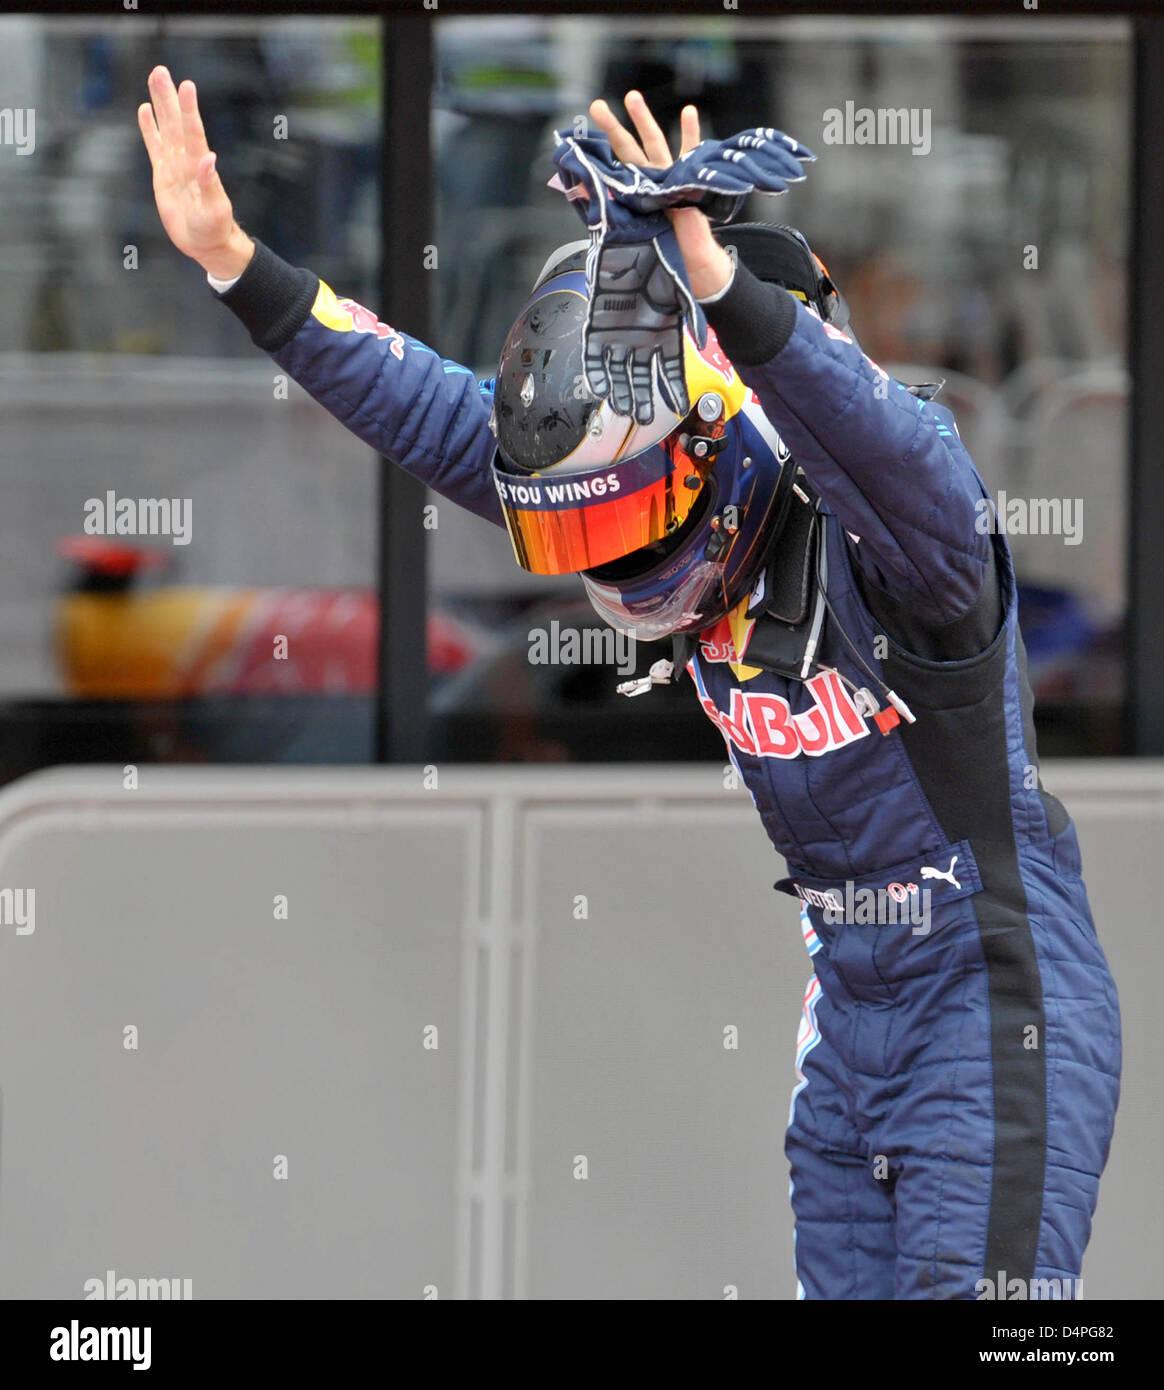 Winner of the race, German Formula One driver Sebastian Vettel (R) of Red Bull celebrates after the Formule One - Stock Image